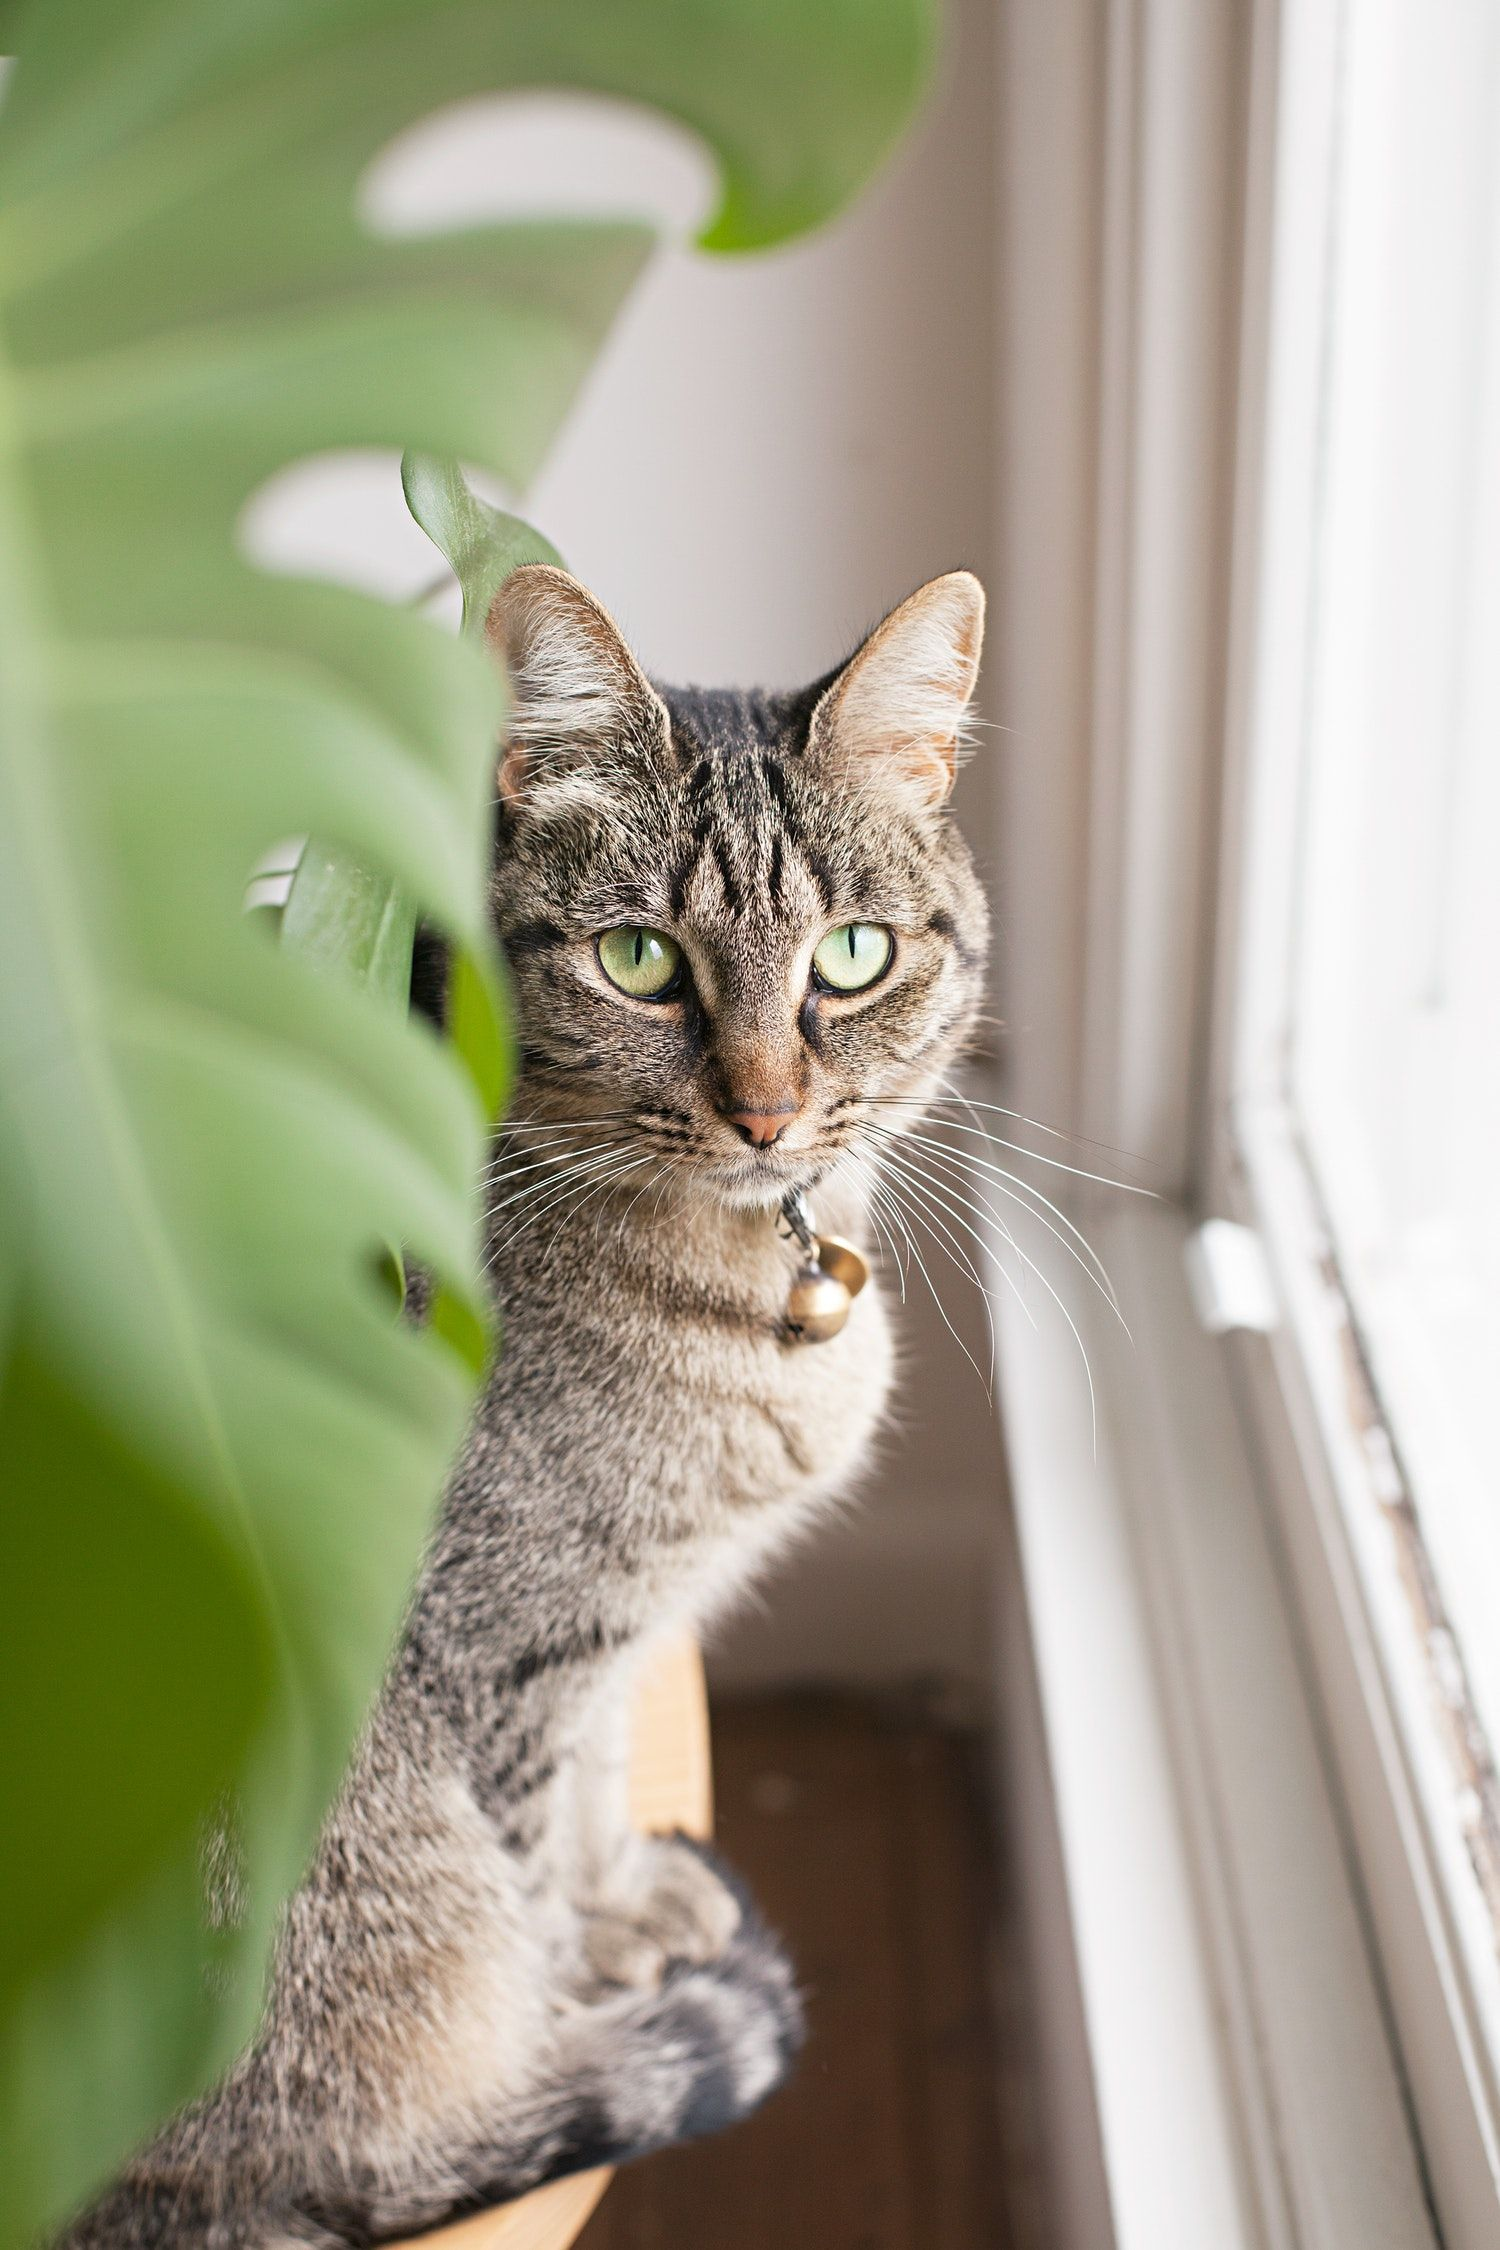 7 Common Houseplants That Can Make Your Pets Quite Sick Cat Safe Plants Toxic Plants For Cats Cat Plants